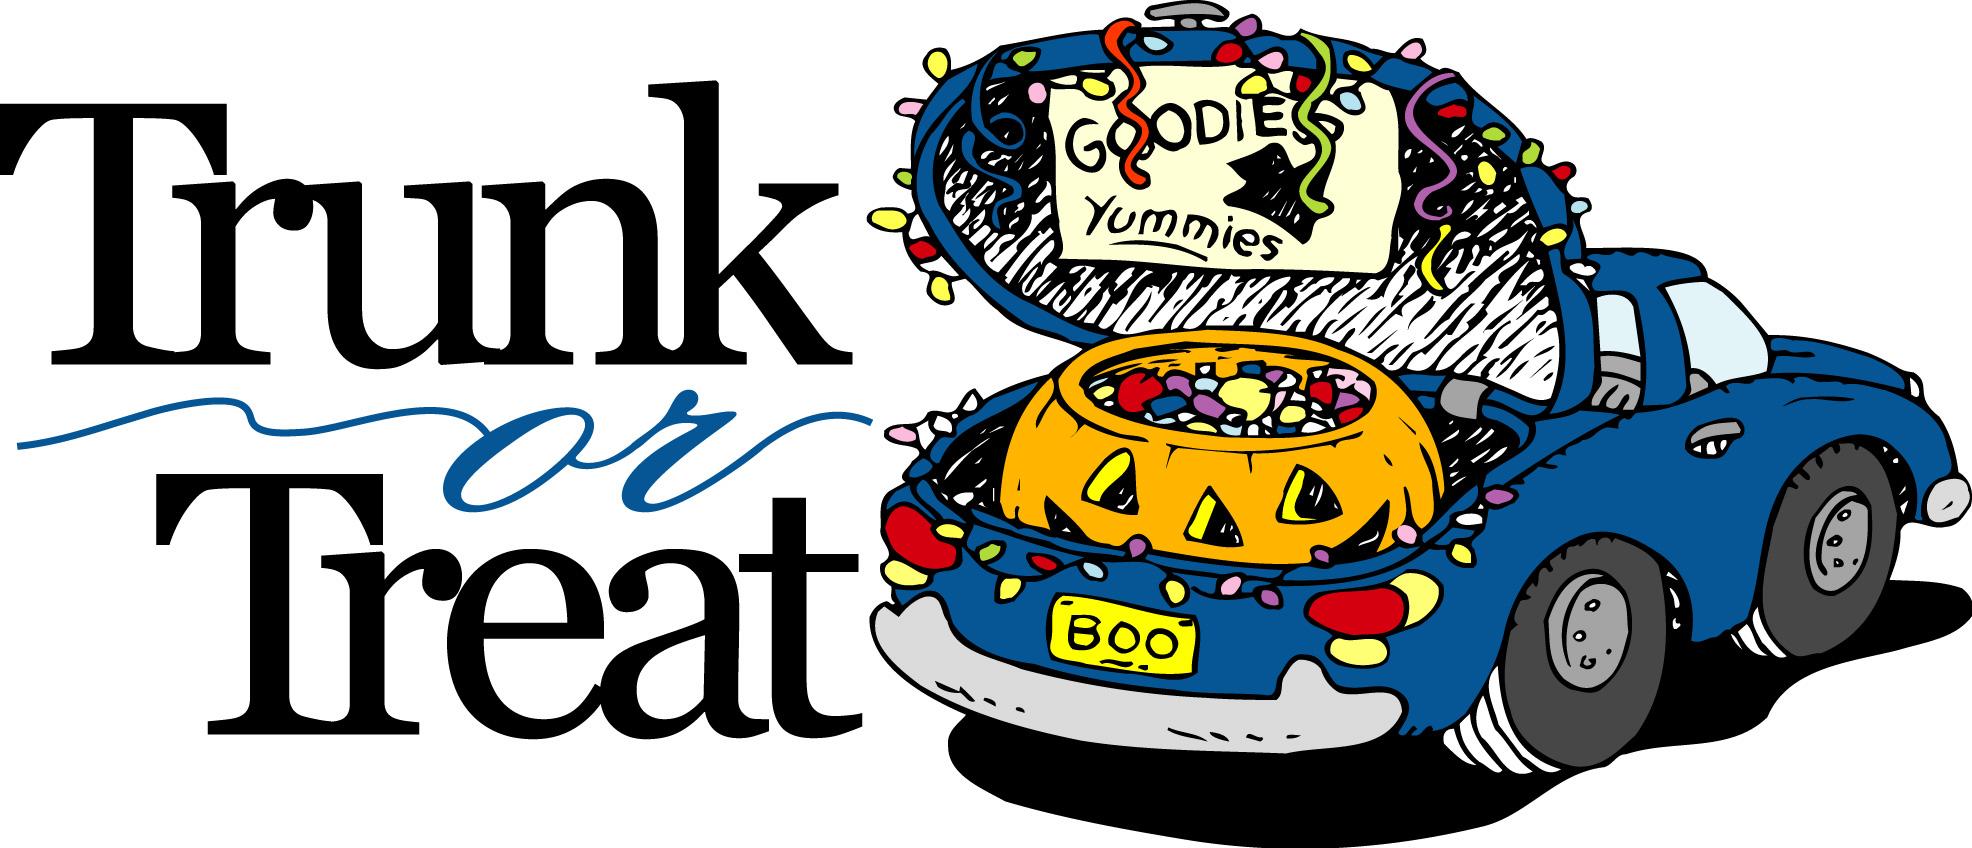 trunk-or-treat-logo